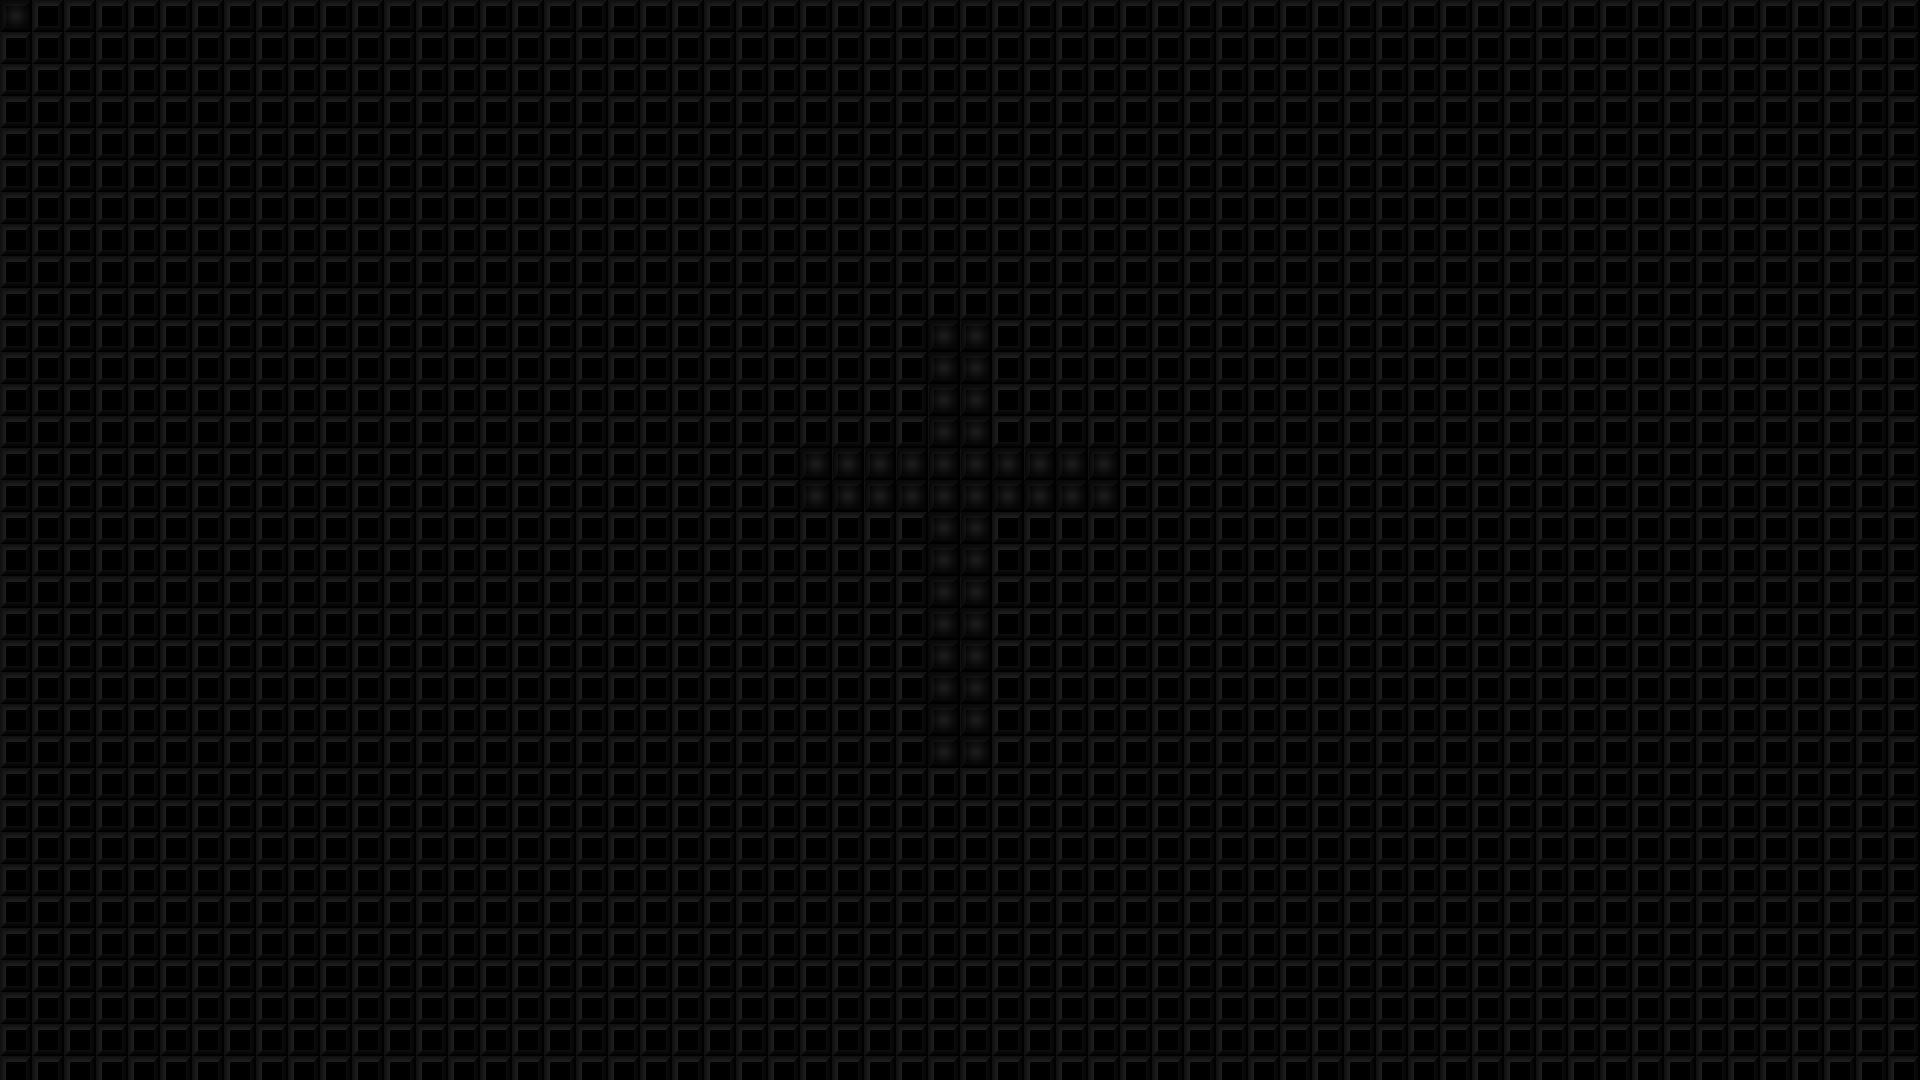 on black background   Tumblr